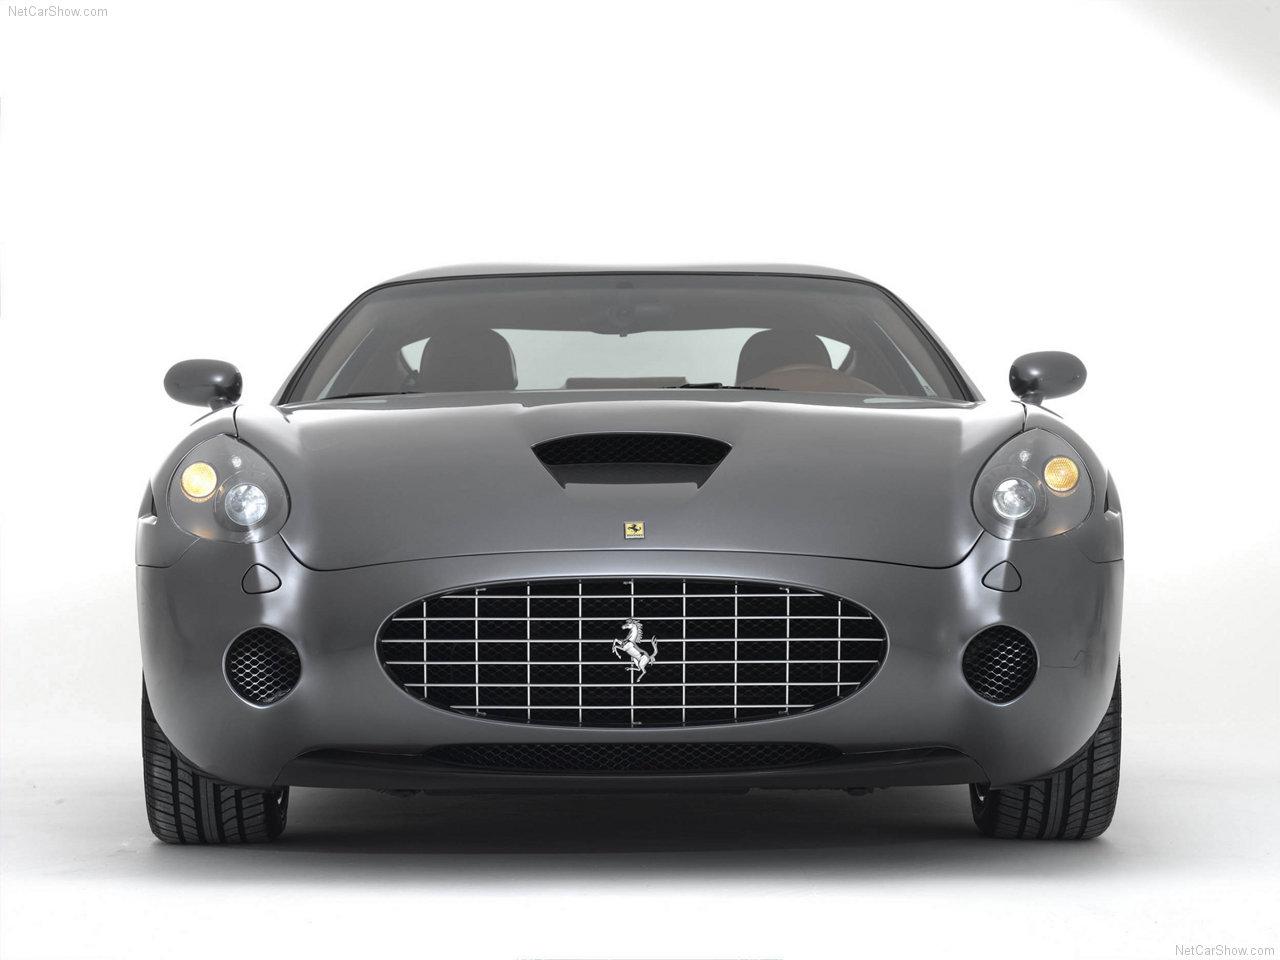 http://4.bp.blogspot.com/-gA26bLnQjFA/TYh_exSK6LI/AAAAAAAACR4/b2-npZhLIcQ/s1600/Ferrari-575_GTZ_Zagato_2006_1280x960_wallpaper_05.jpg